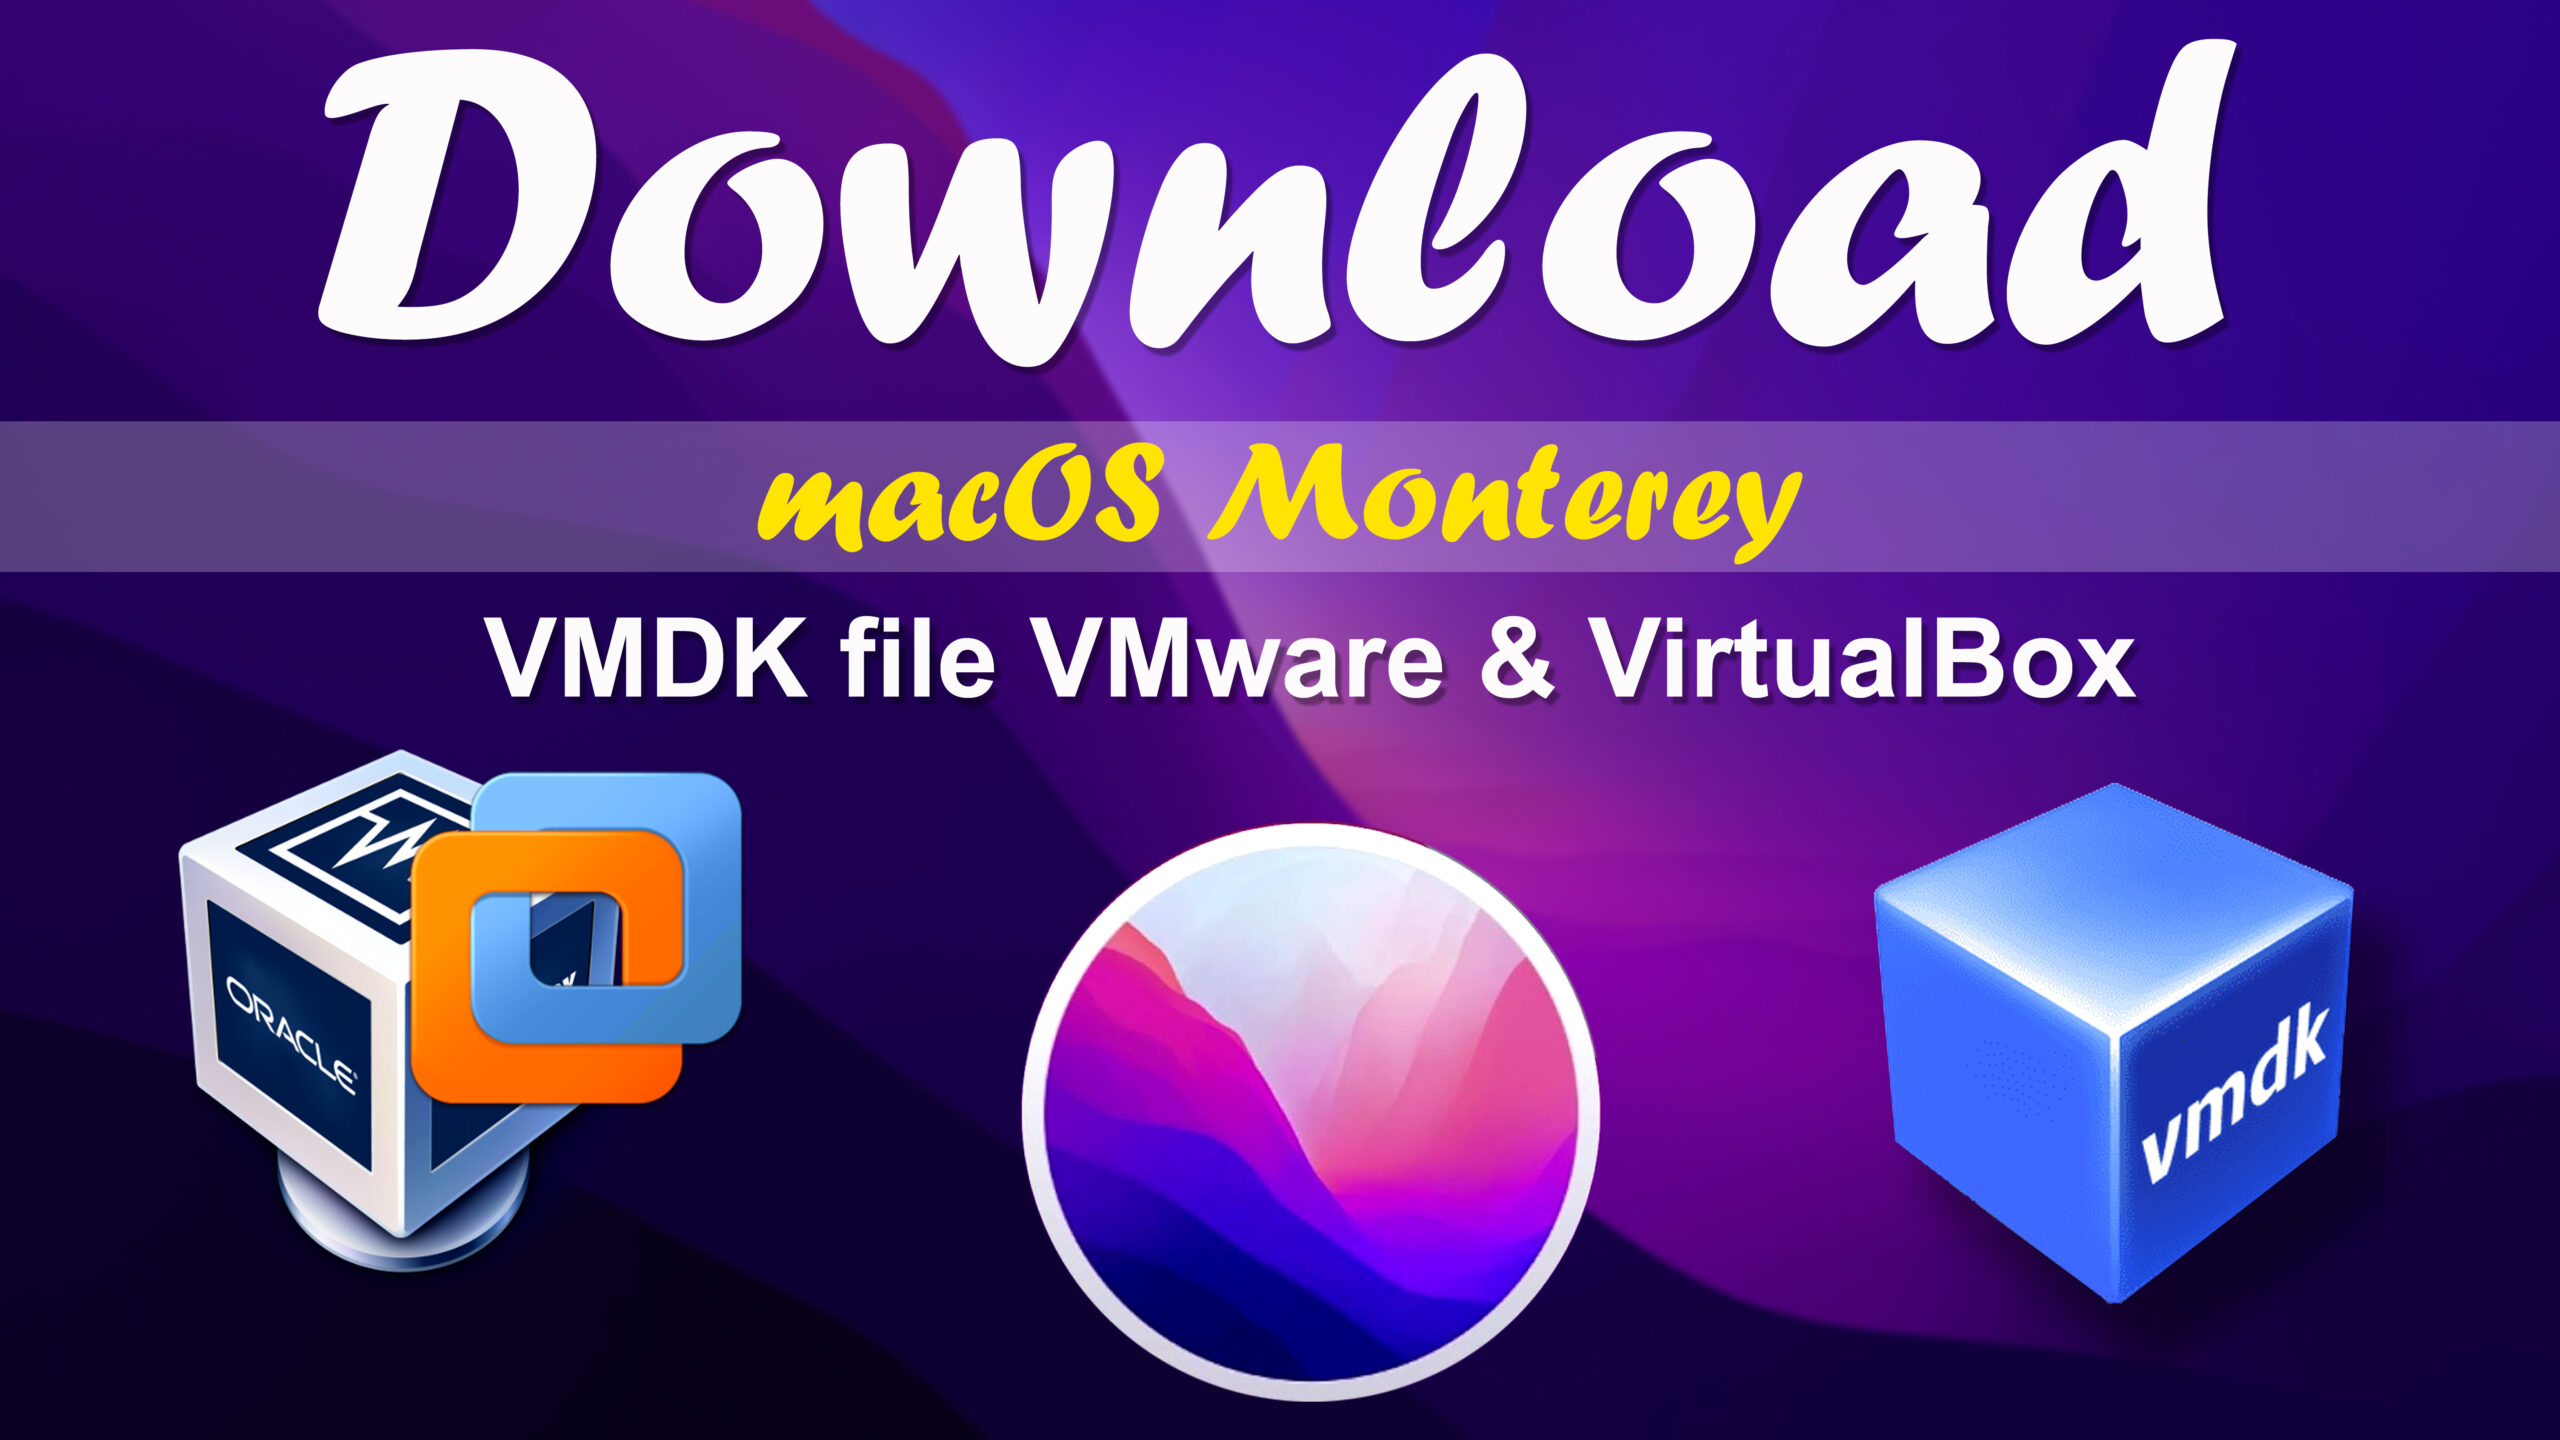 Download macOS Monterey VMDK File (VMware & VirtualBox)